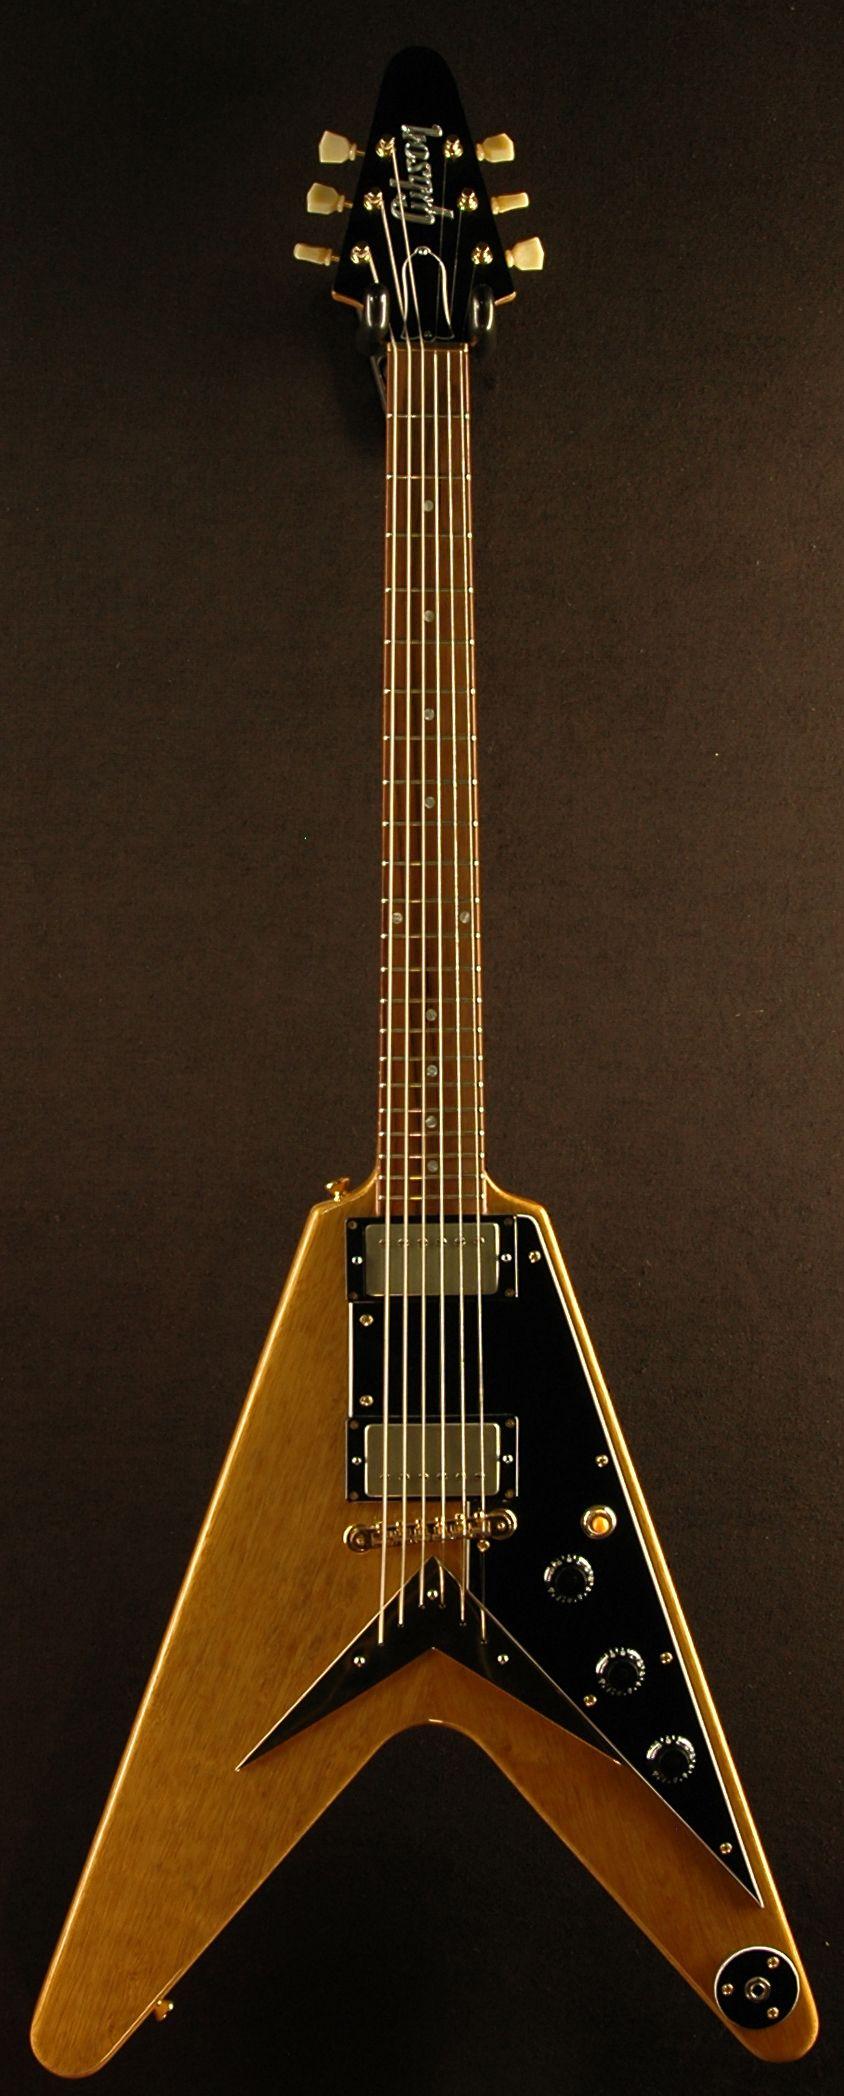 gibson flying v electric guitar gibson guitars music guitar fender guitars. Black Bedroom Furniture Sets. Home Design Ideas